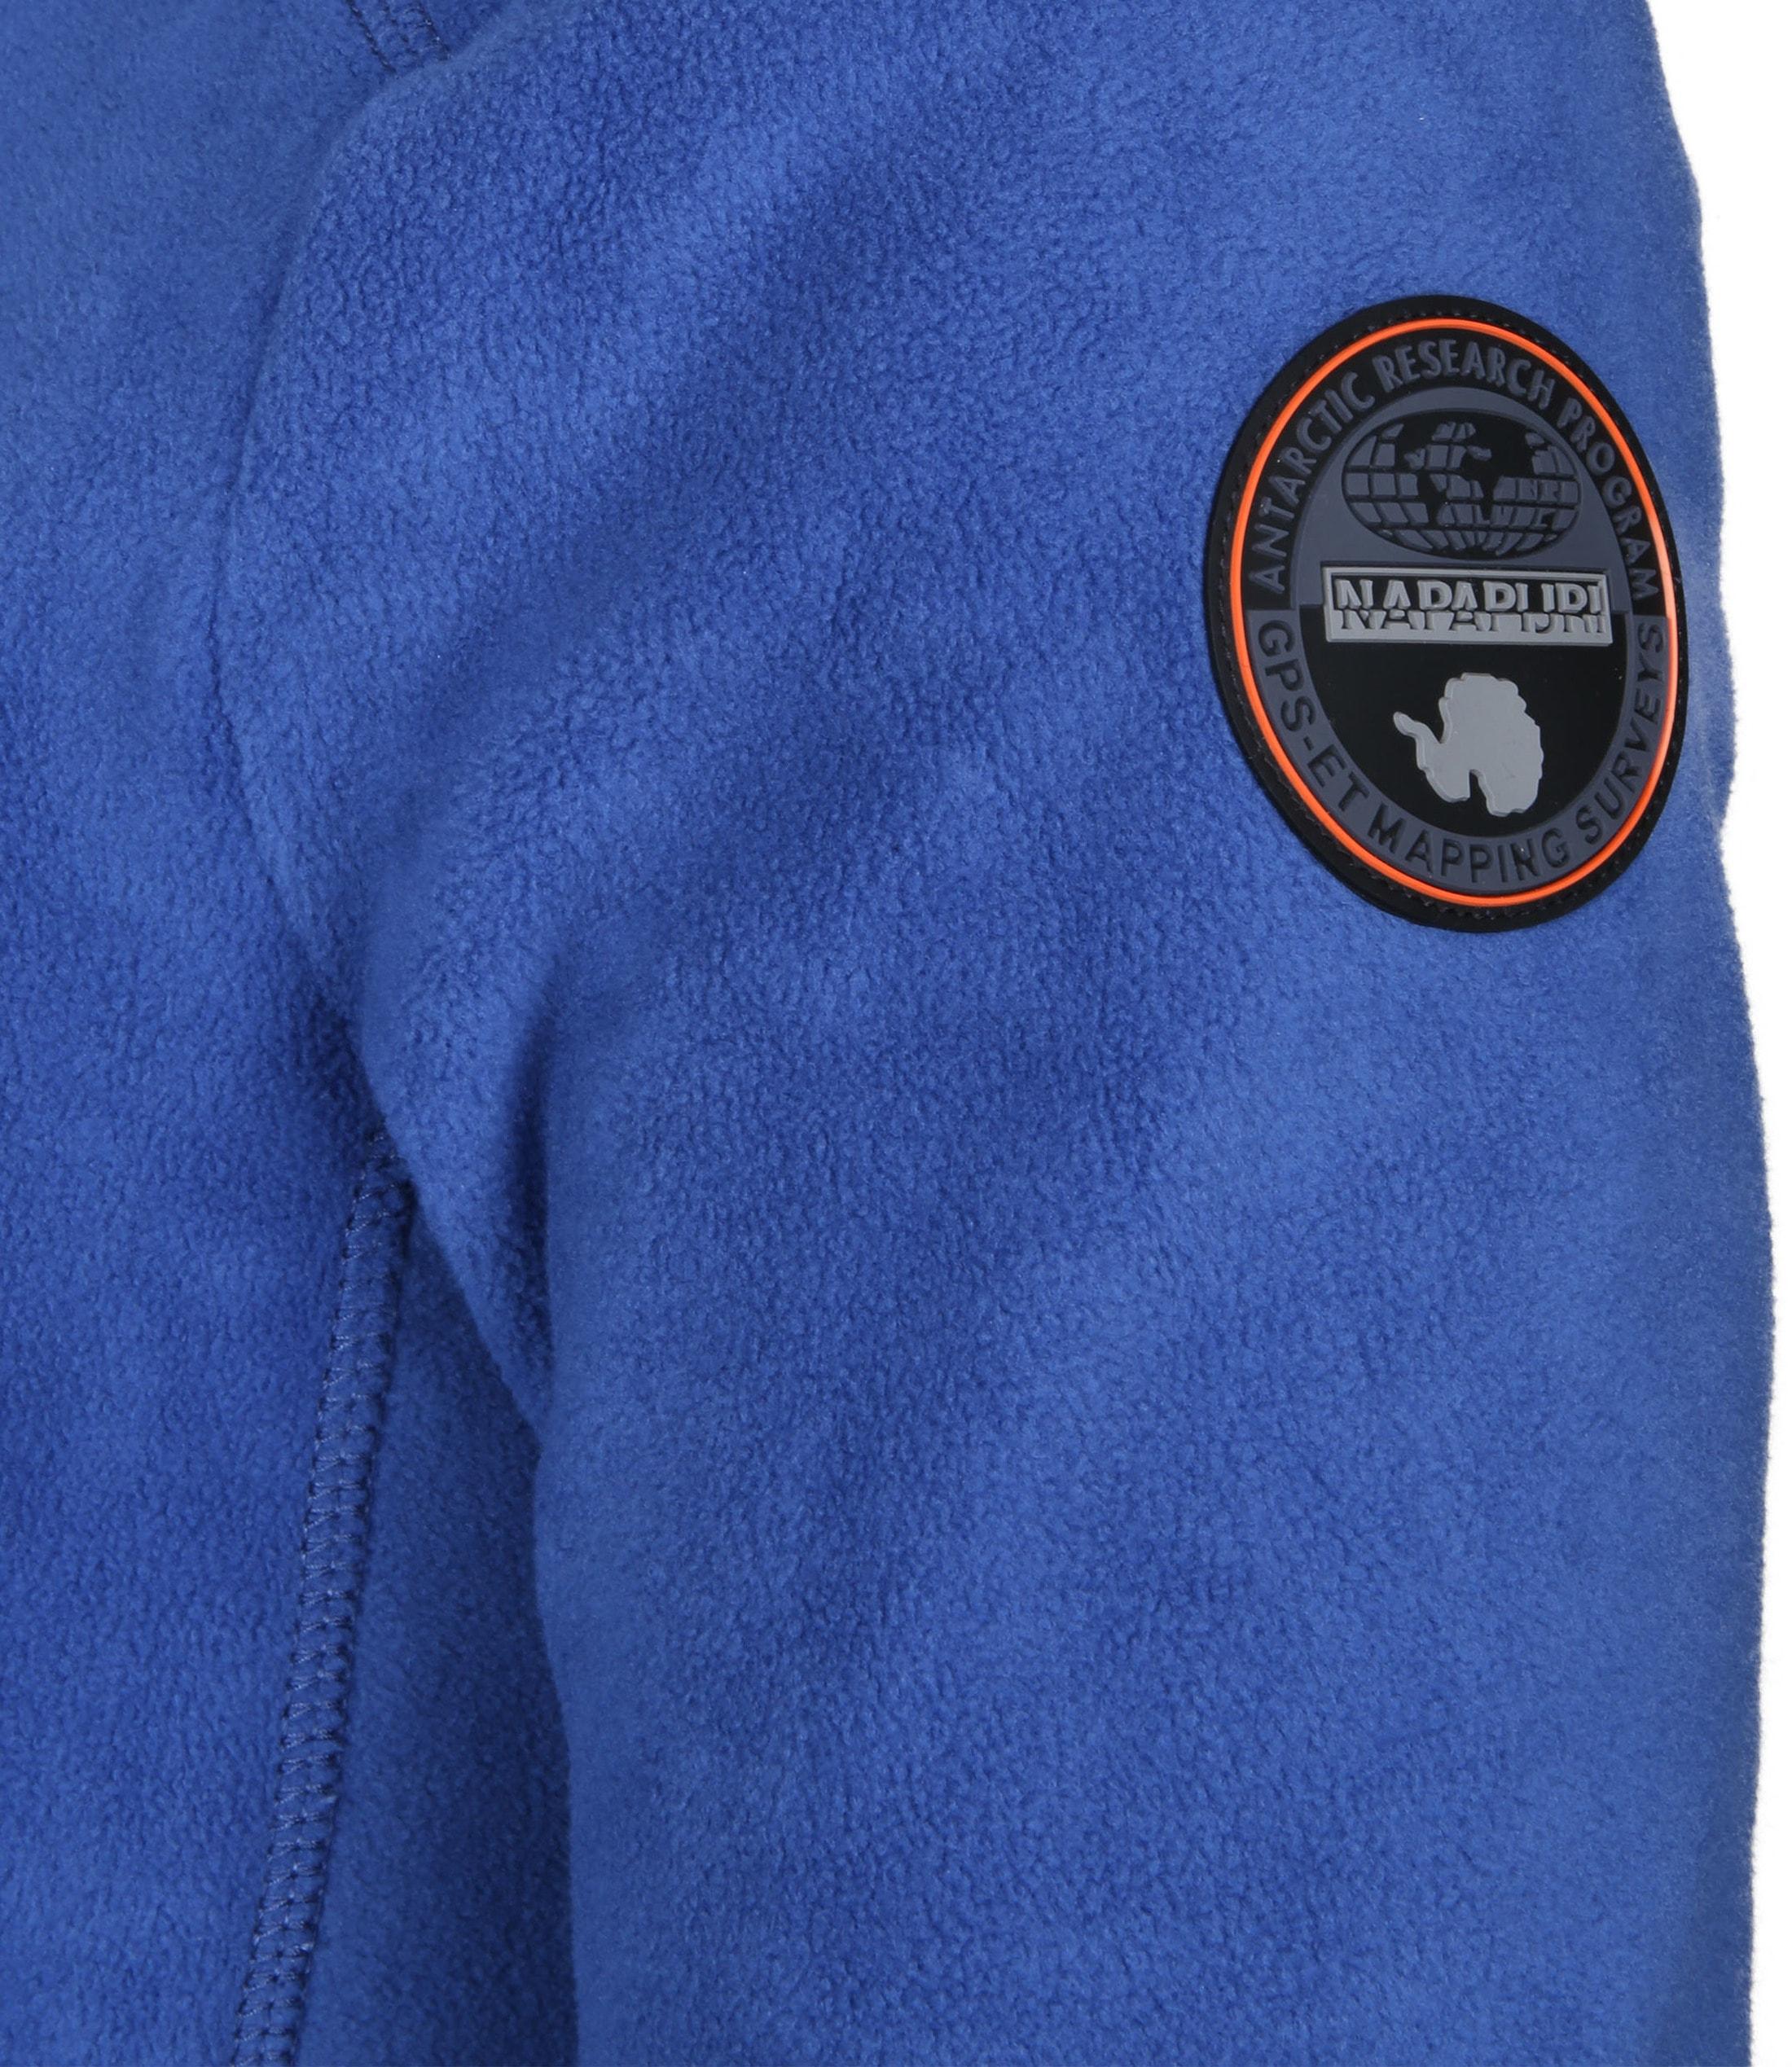 Napapijri Fleece Vest Tambo Kobalt foto 2